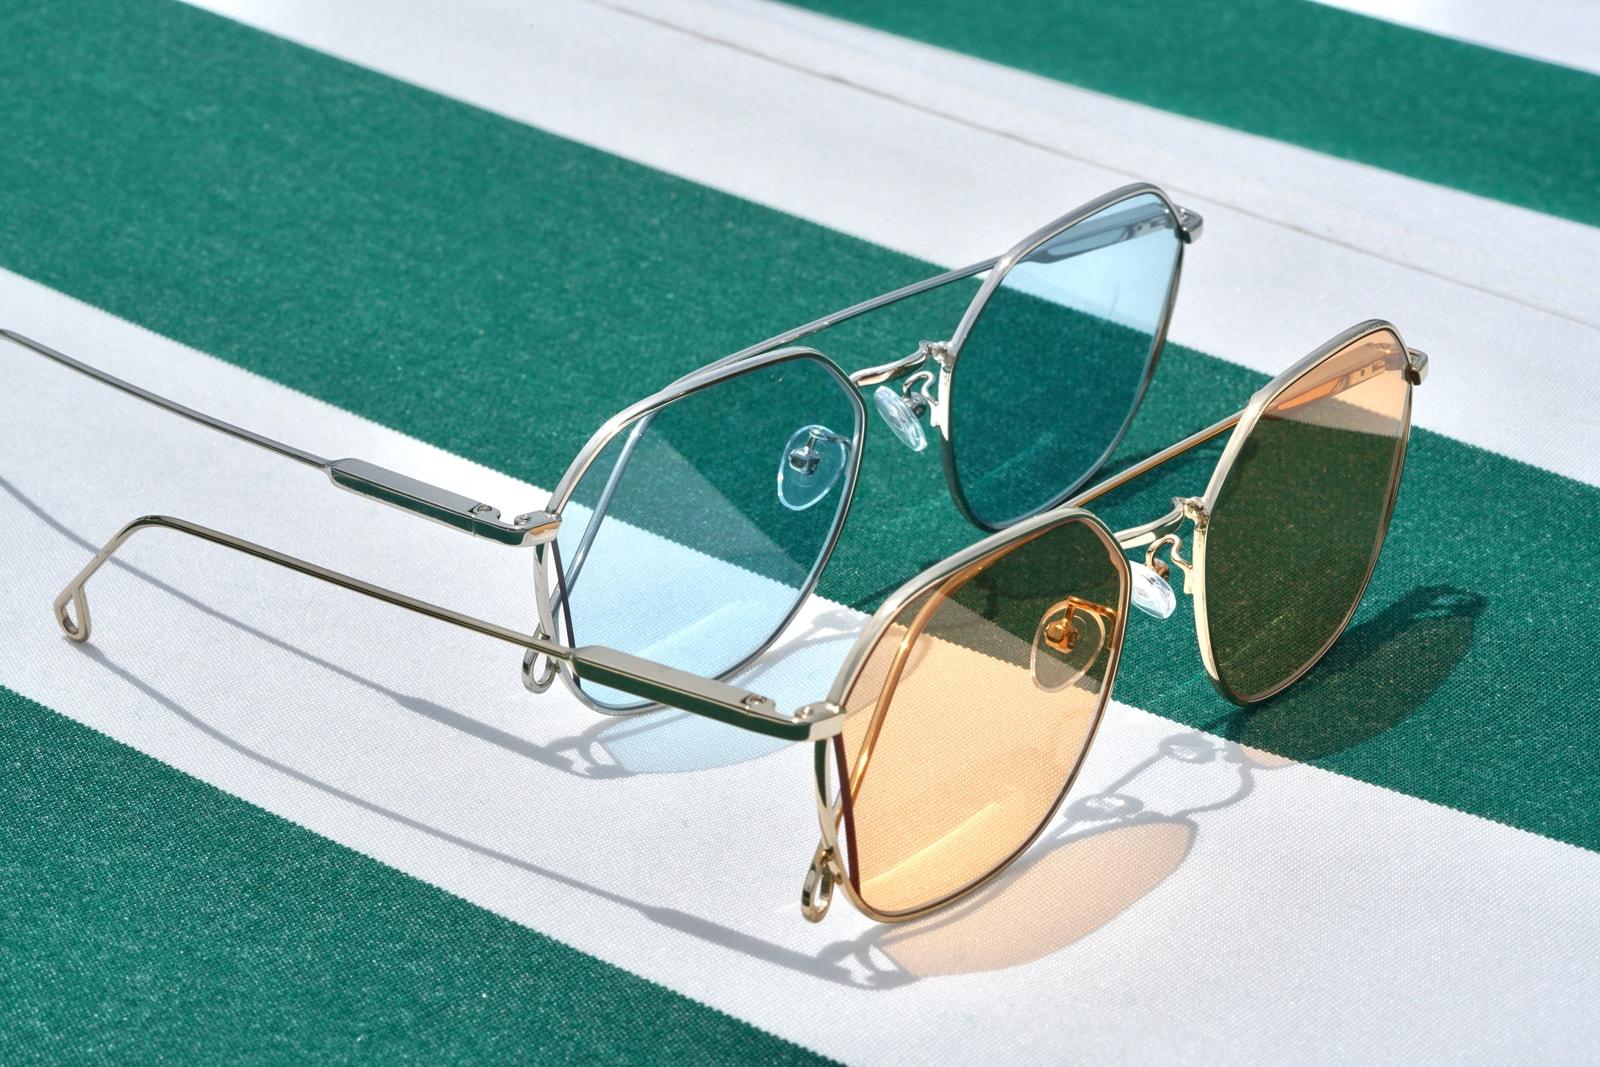 Peppertint Sunglasses Cutaway Collection Lookbook Shades Frames Metal Tint Color Hong Kong Los Angeles California Inspiration Design Classic